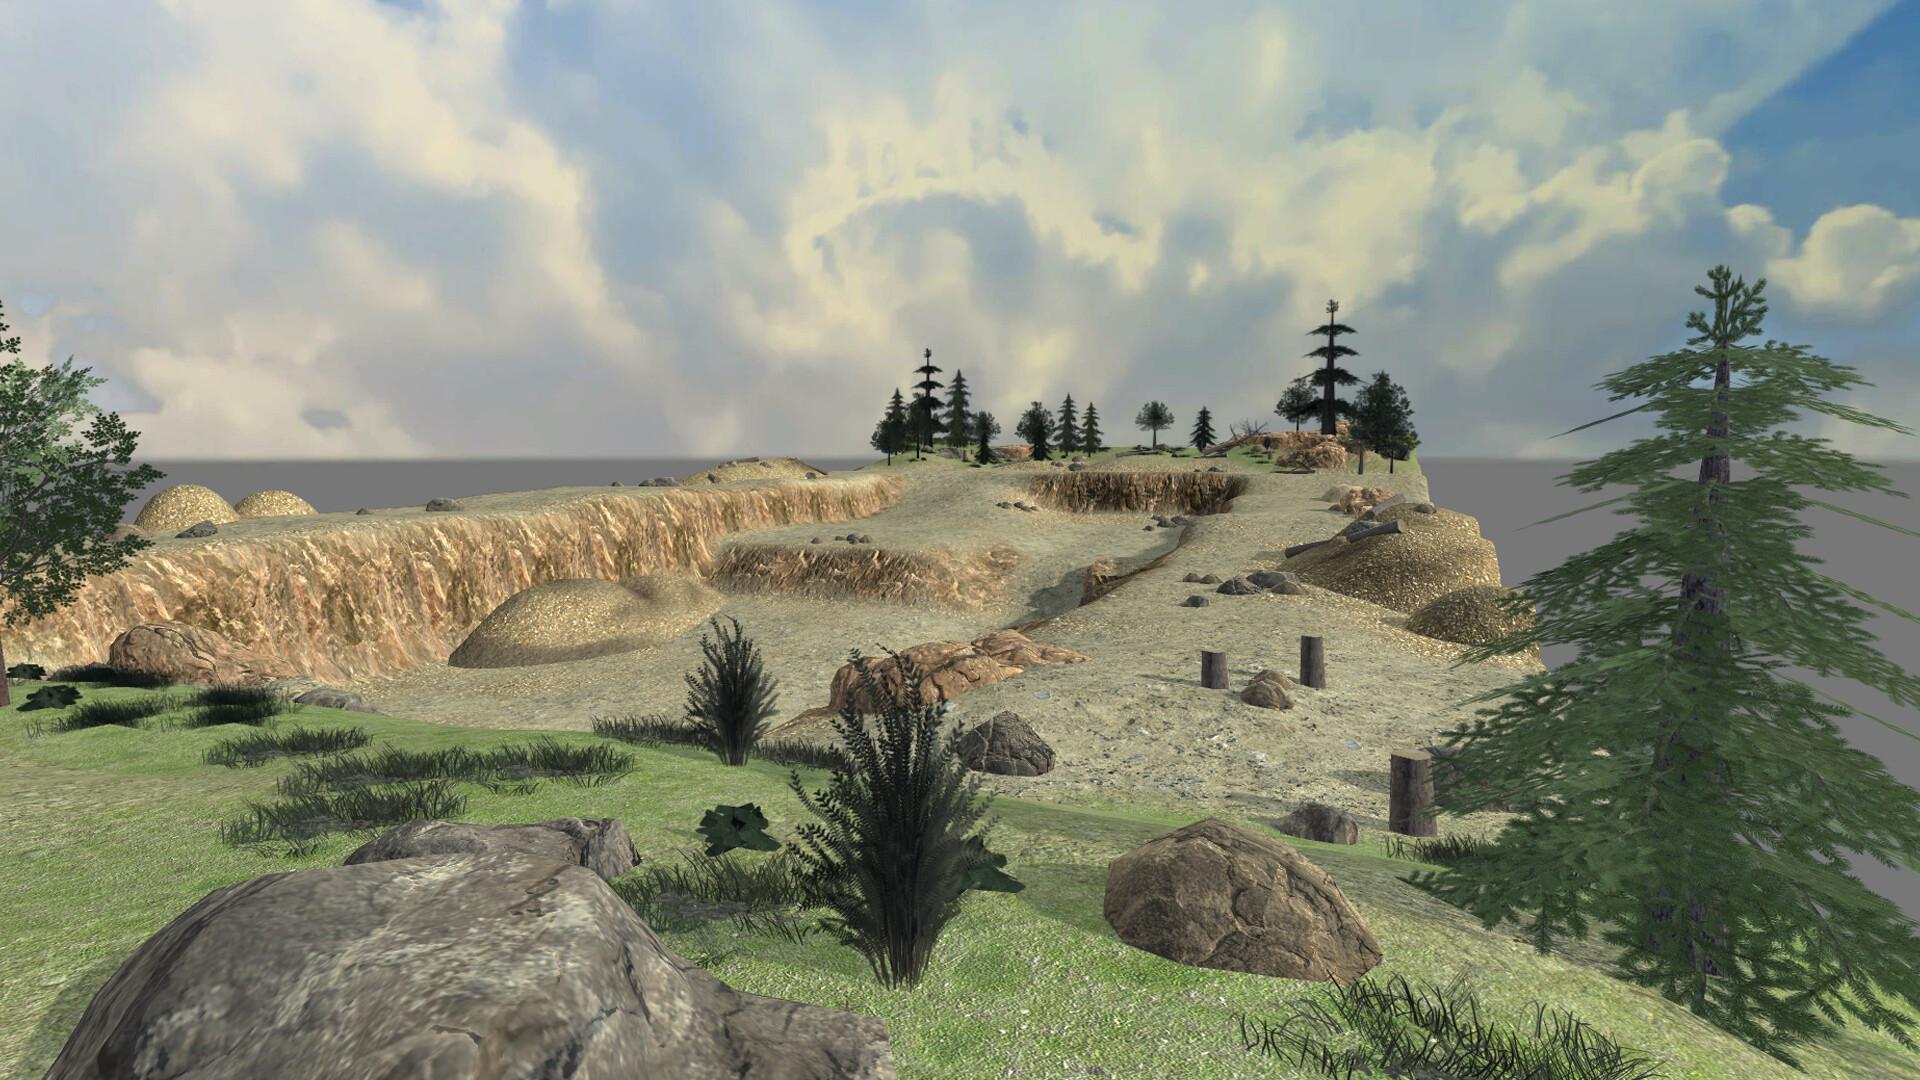 Jordan cameron quarry 20